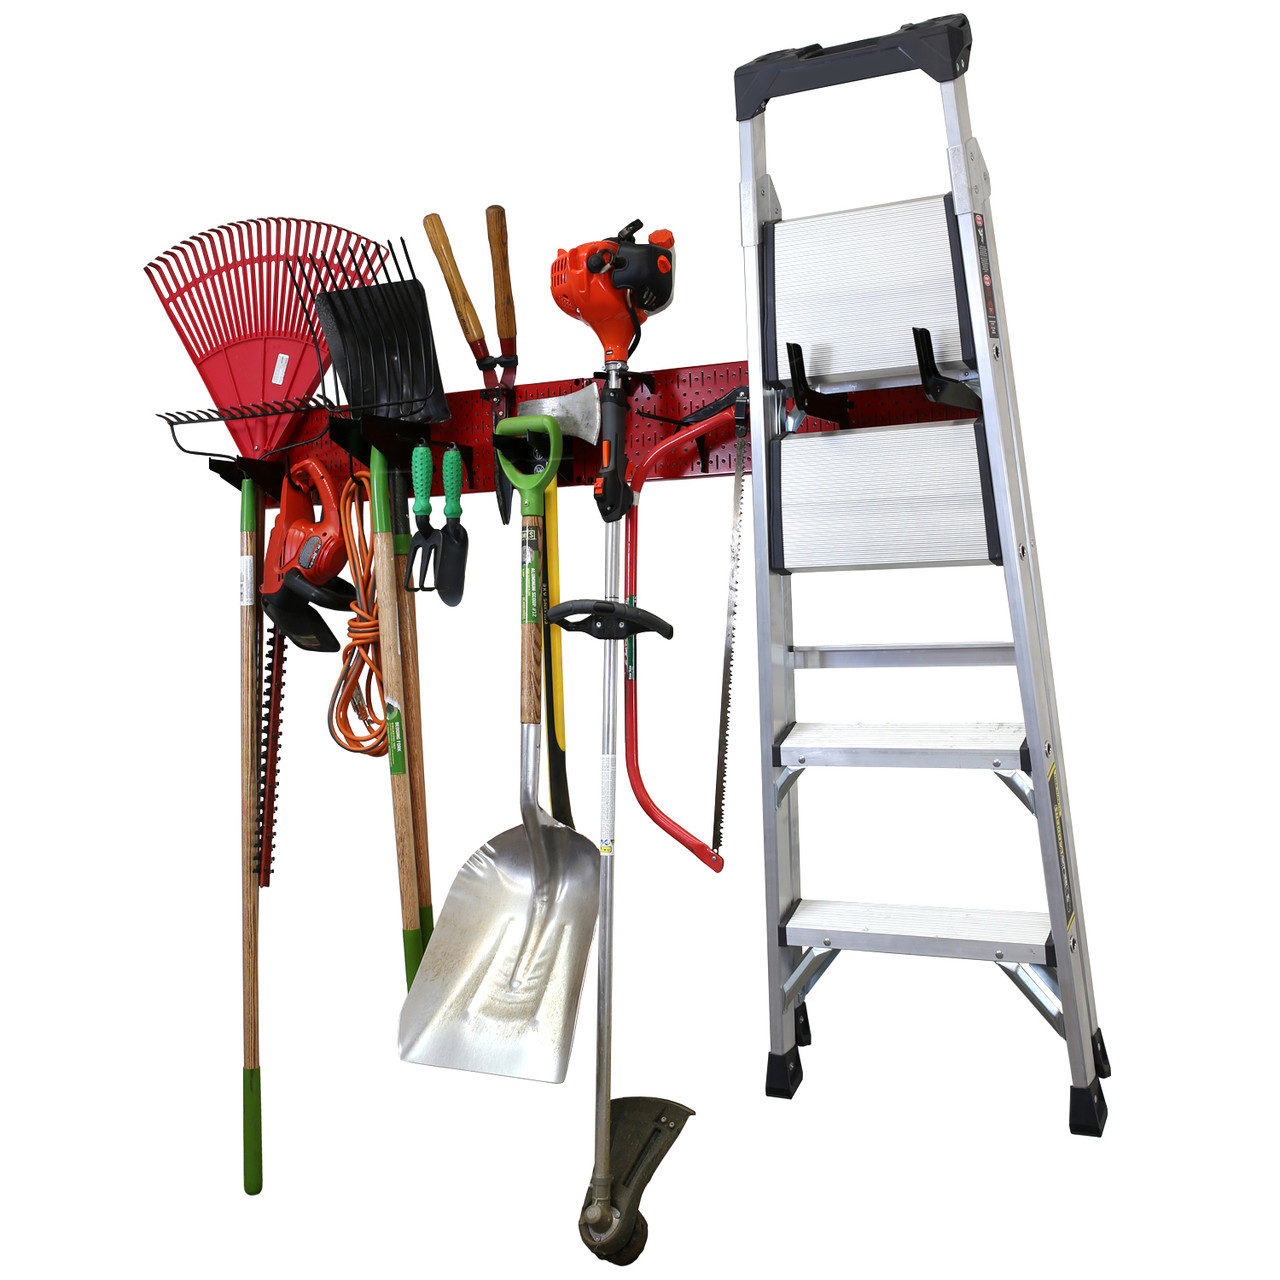 Garage Storage Lawn Garden Tool Organization Wall Organizer Rack Red Pegboard With Accessories